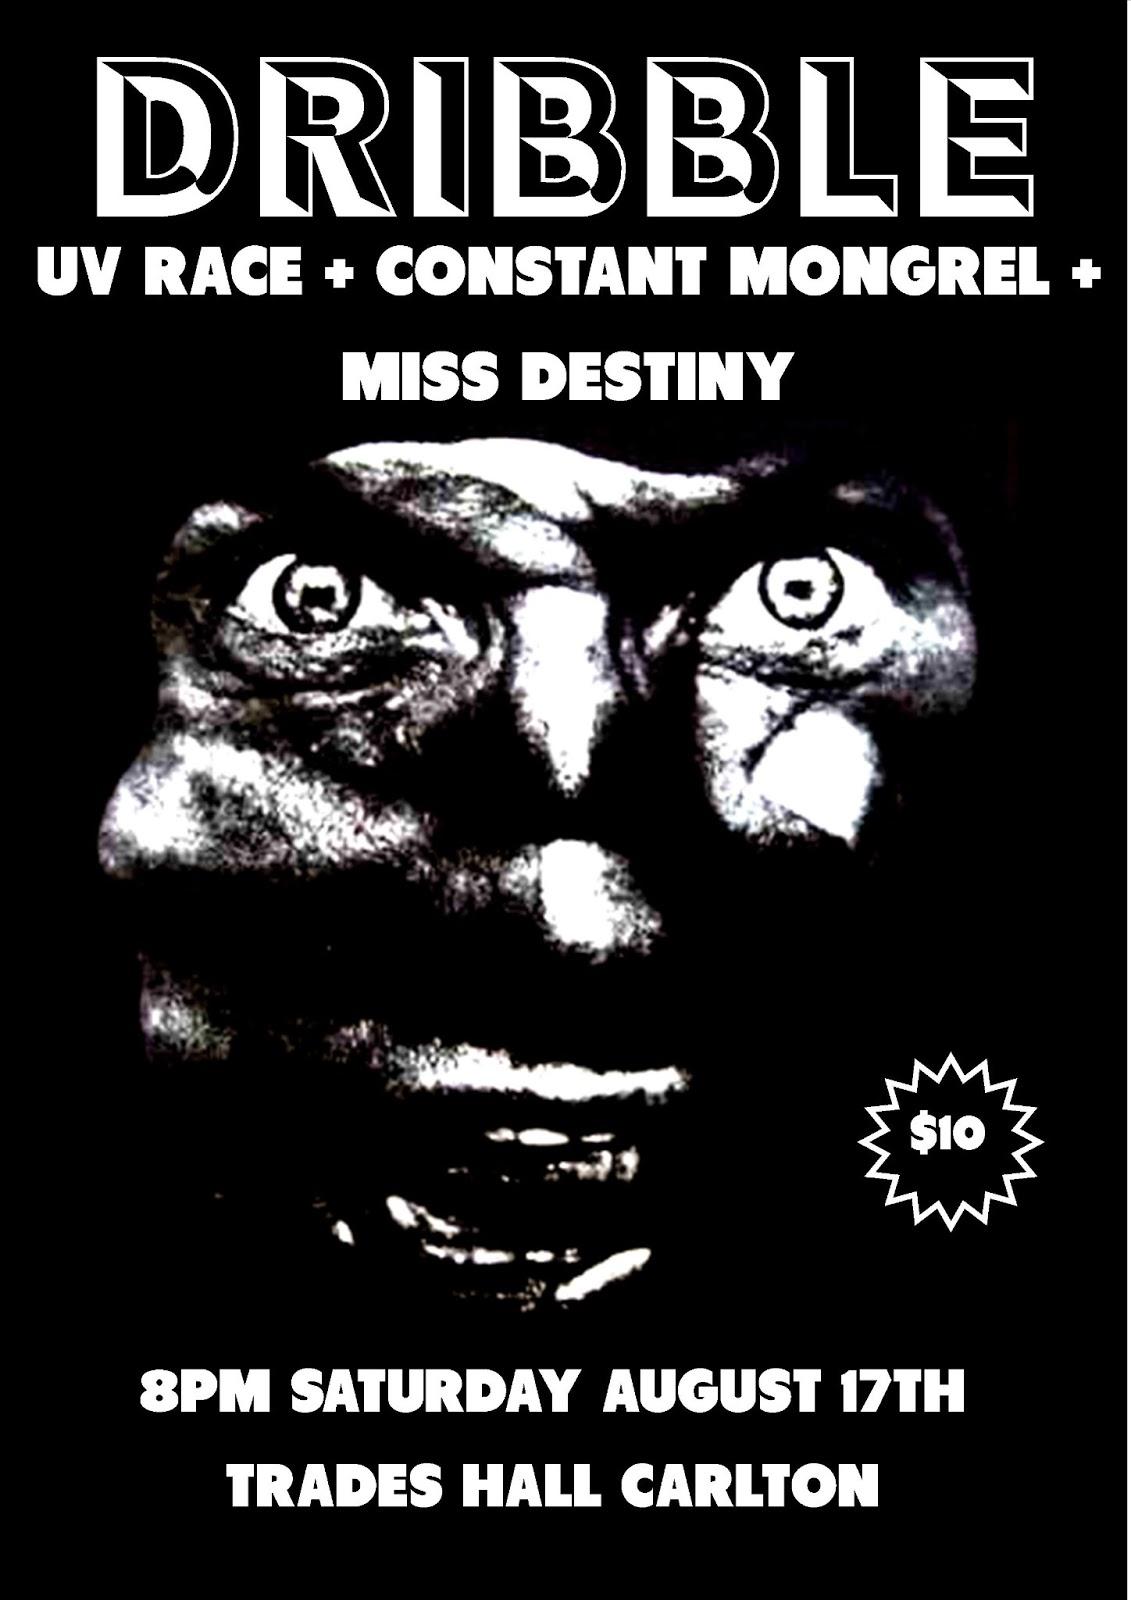 Constant Mongrel - Heavy Breathing